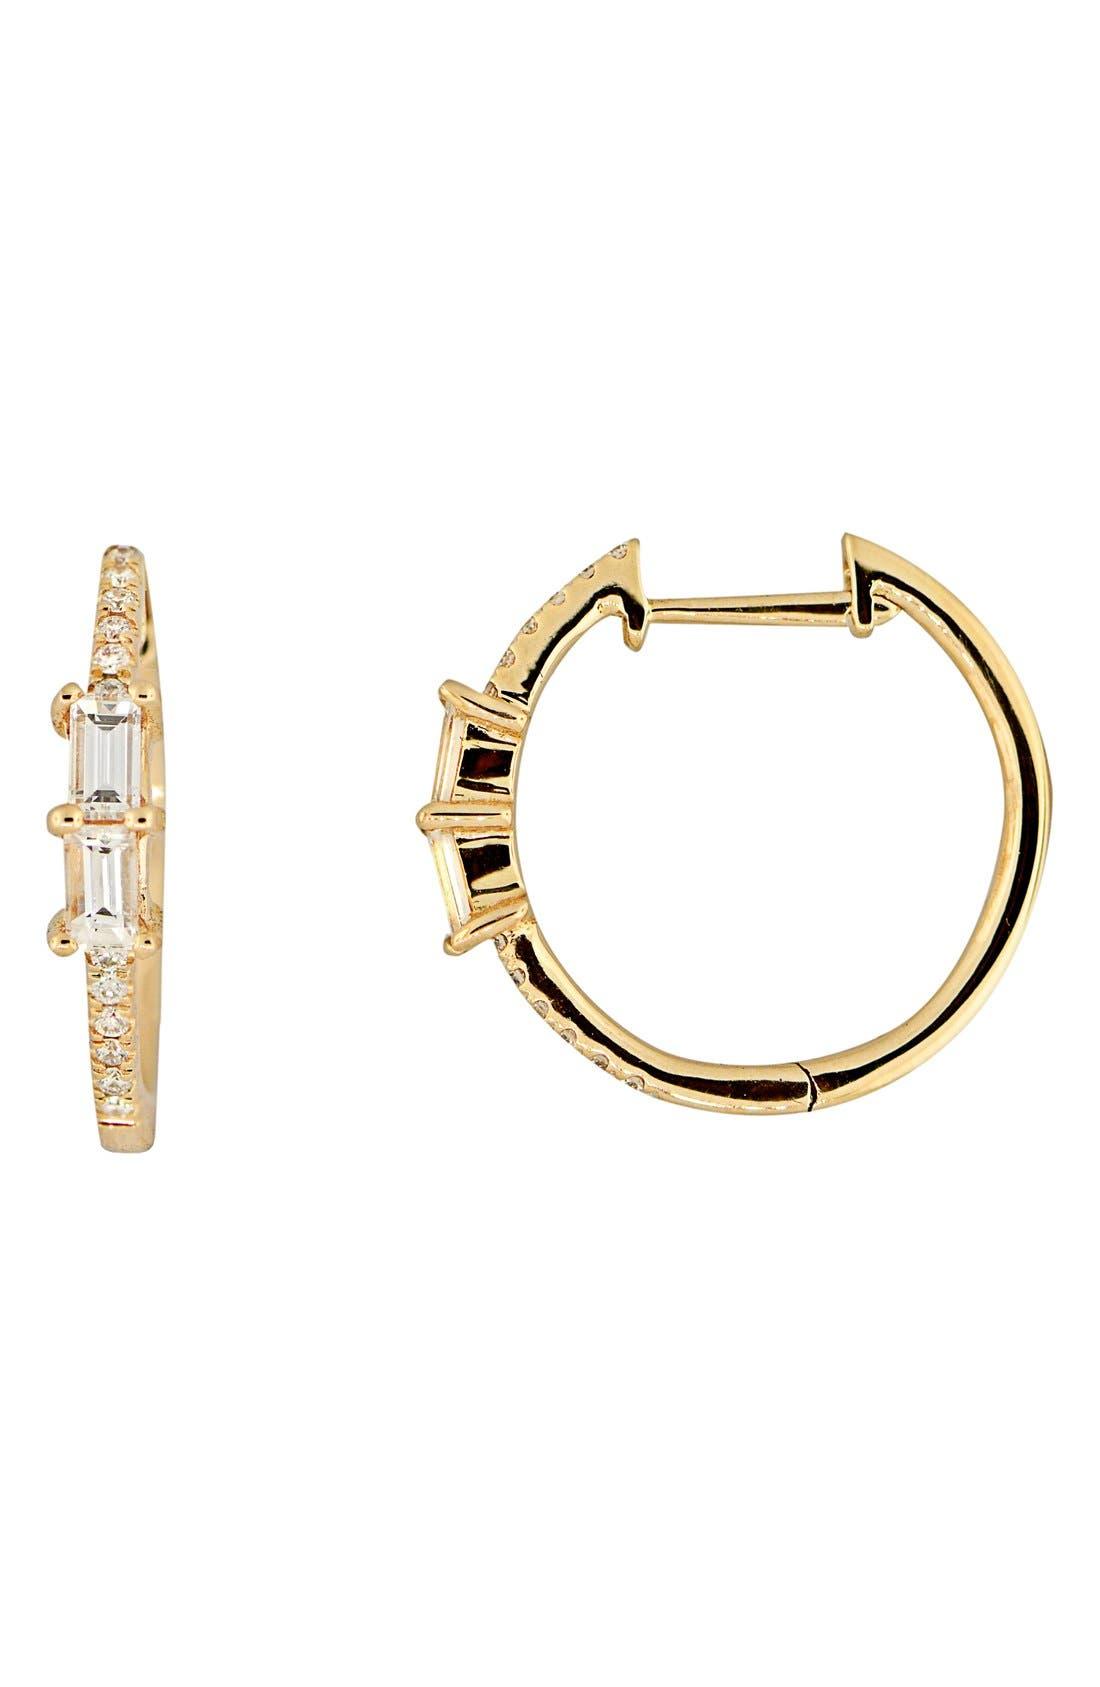 Diamond Hoop Earrings,                             Main thumbnail 1, color,                             YELLOW GOLD